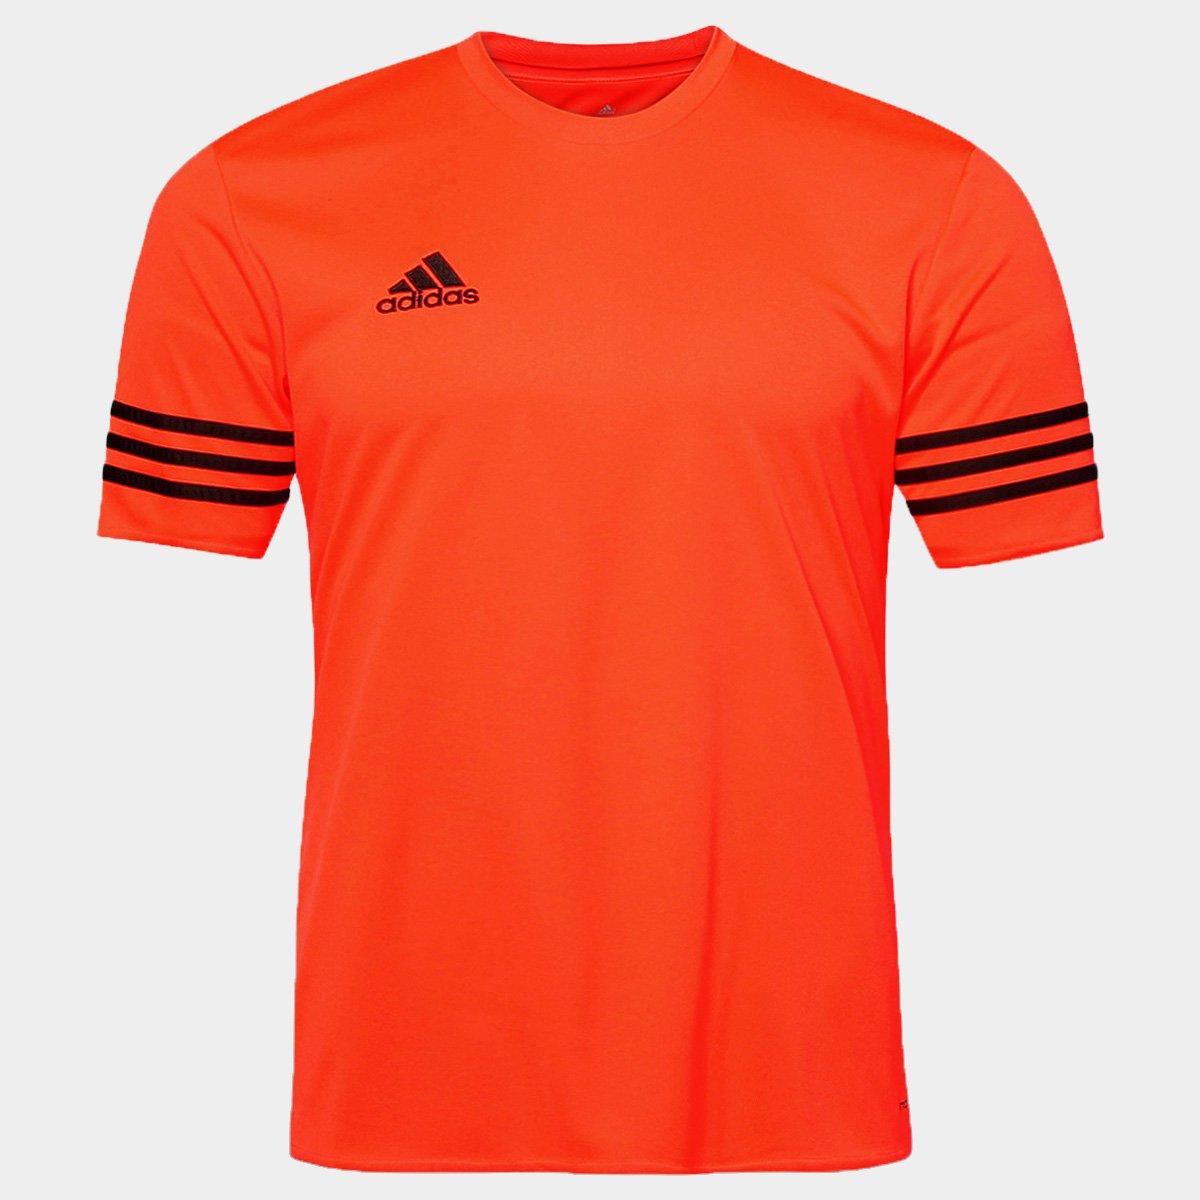 Camisa Adidas Entrada 14 Masculina - Compre Agora  1128638beaf